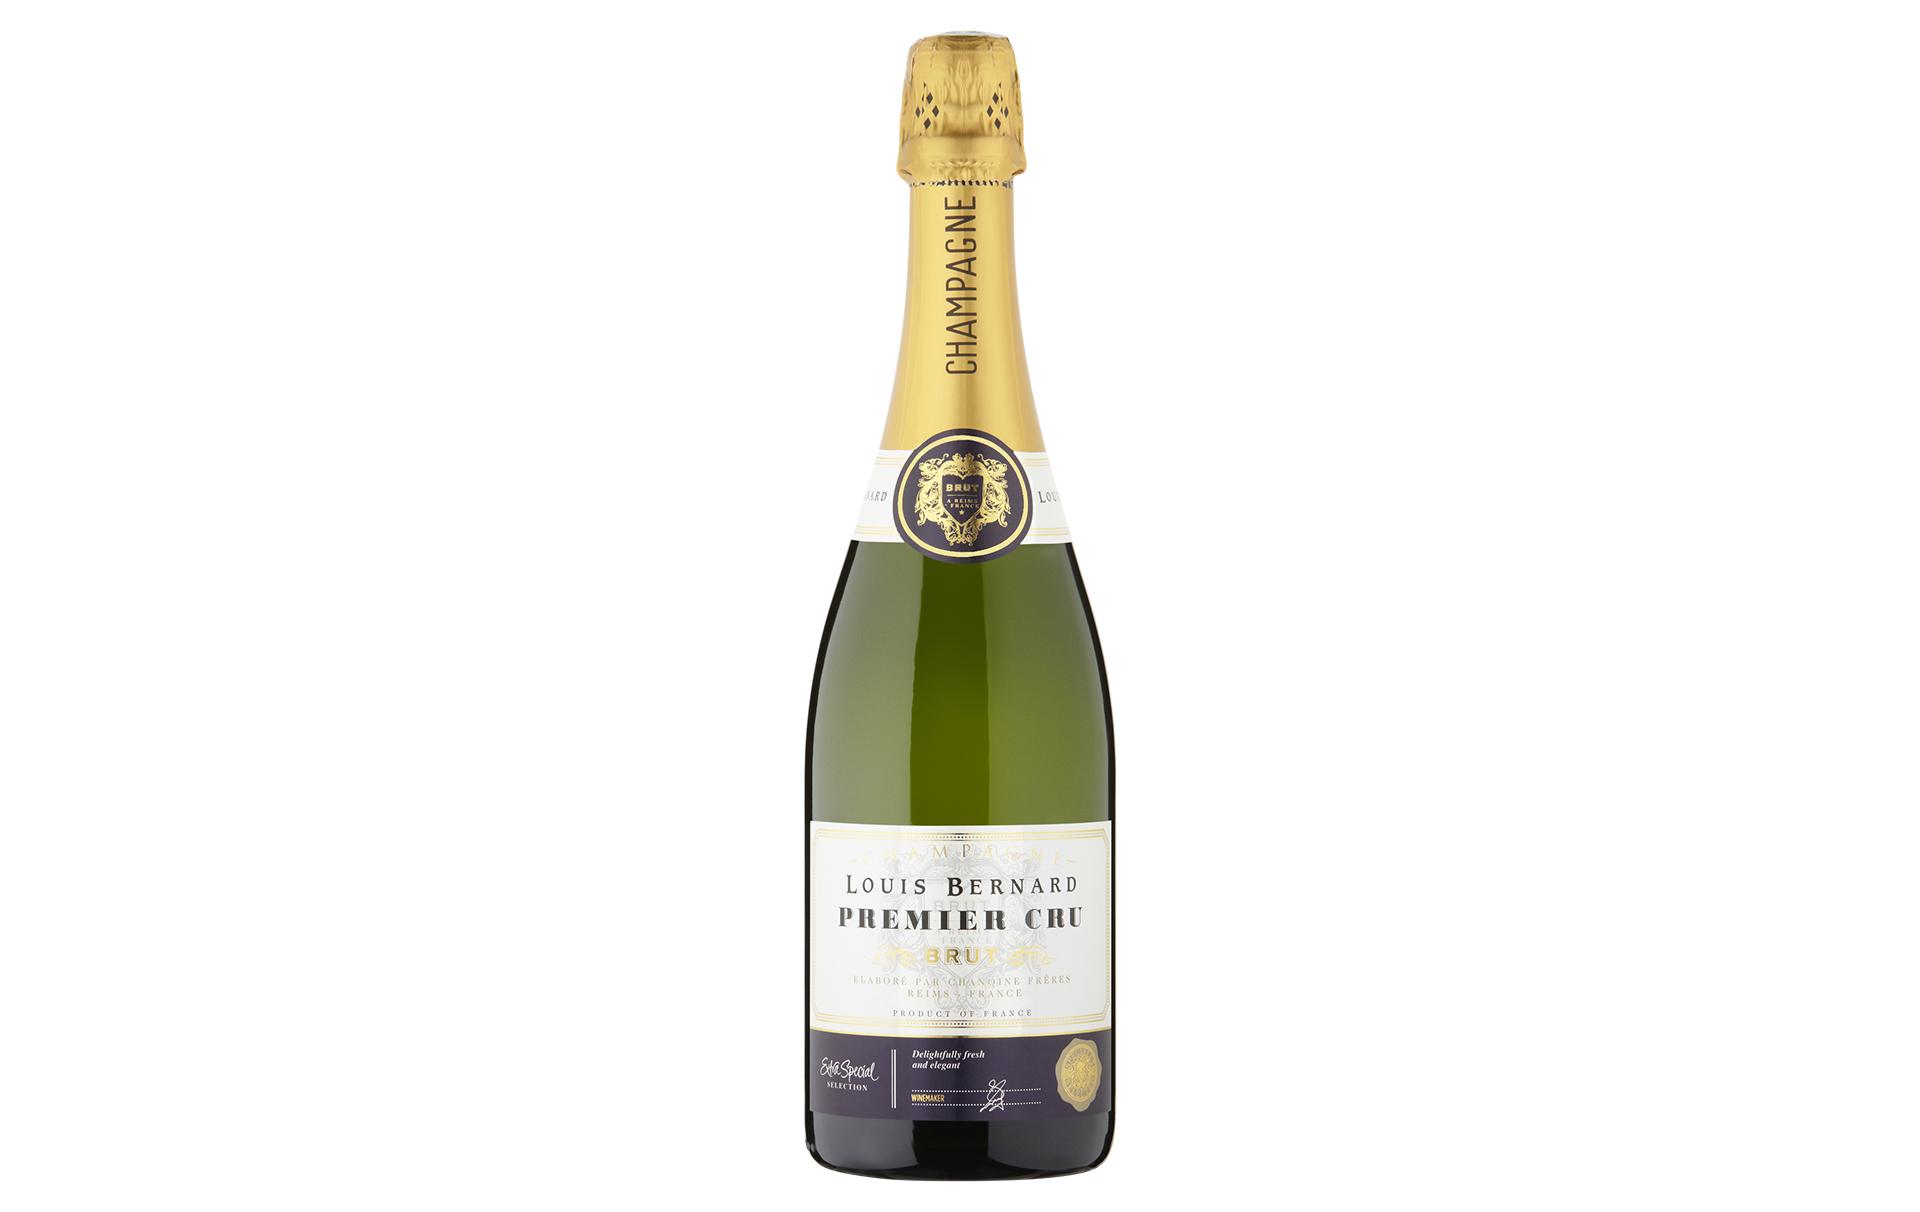 asda fizz wins best champagne